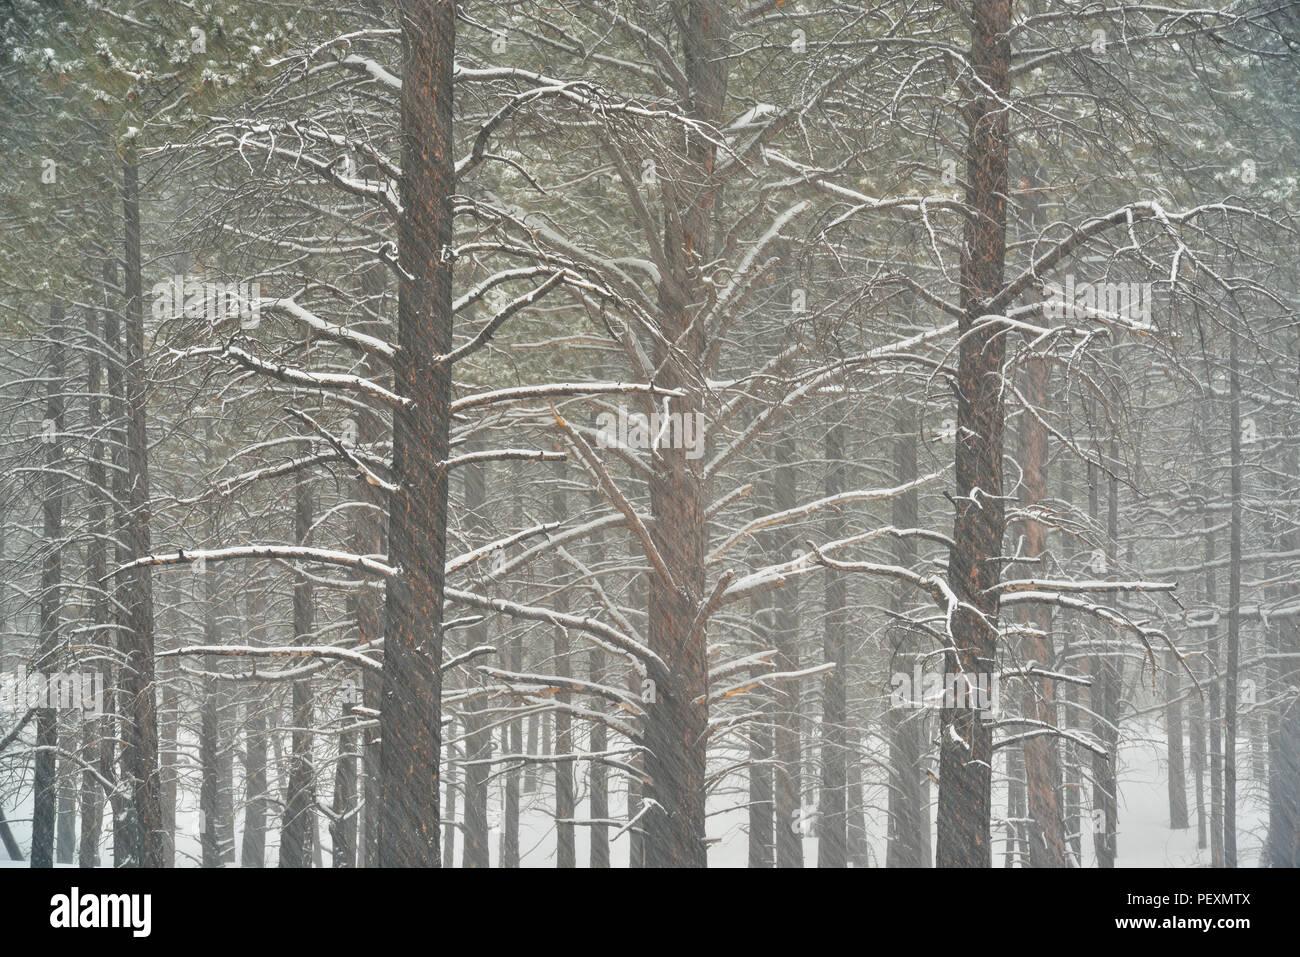 Ponderosa Pine (Pinus ponderosa) forest in winter, Bryce Canyon National Park, Utah, USA - Stock Image